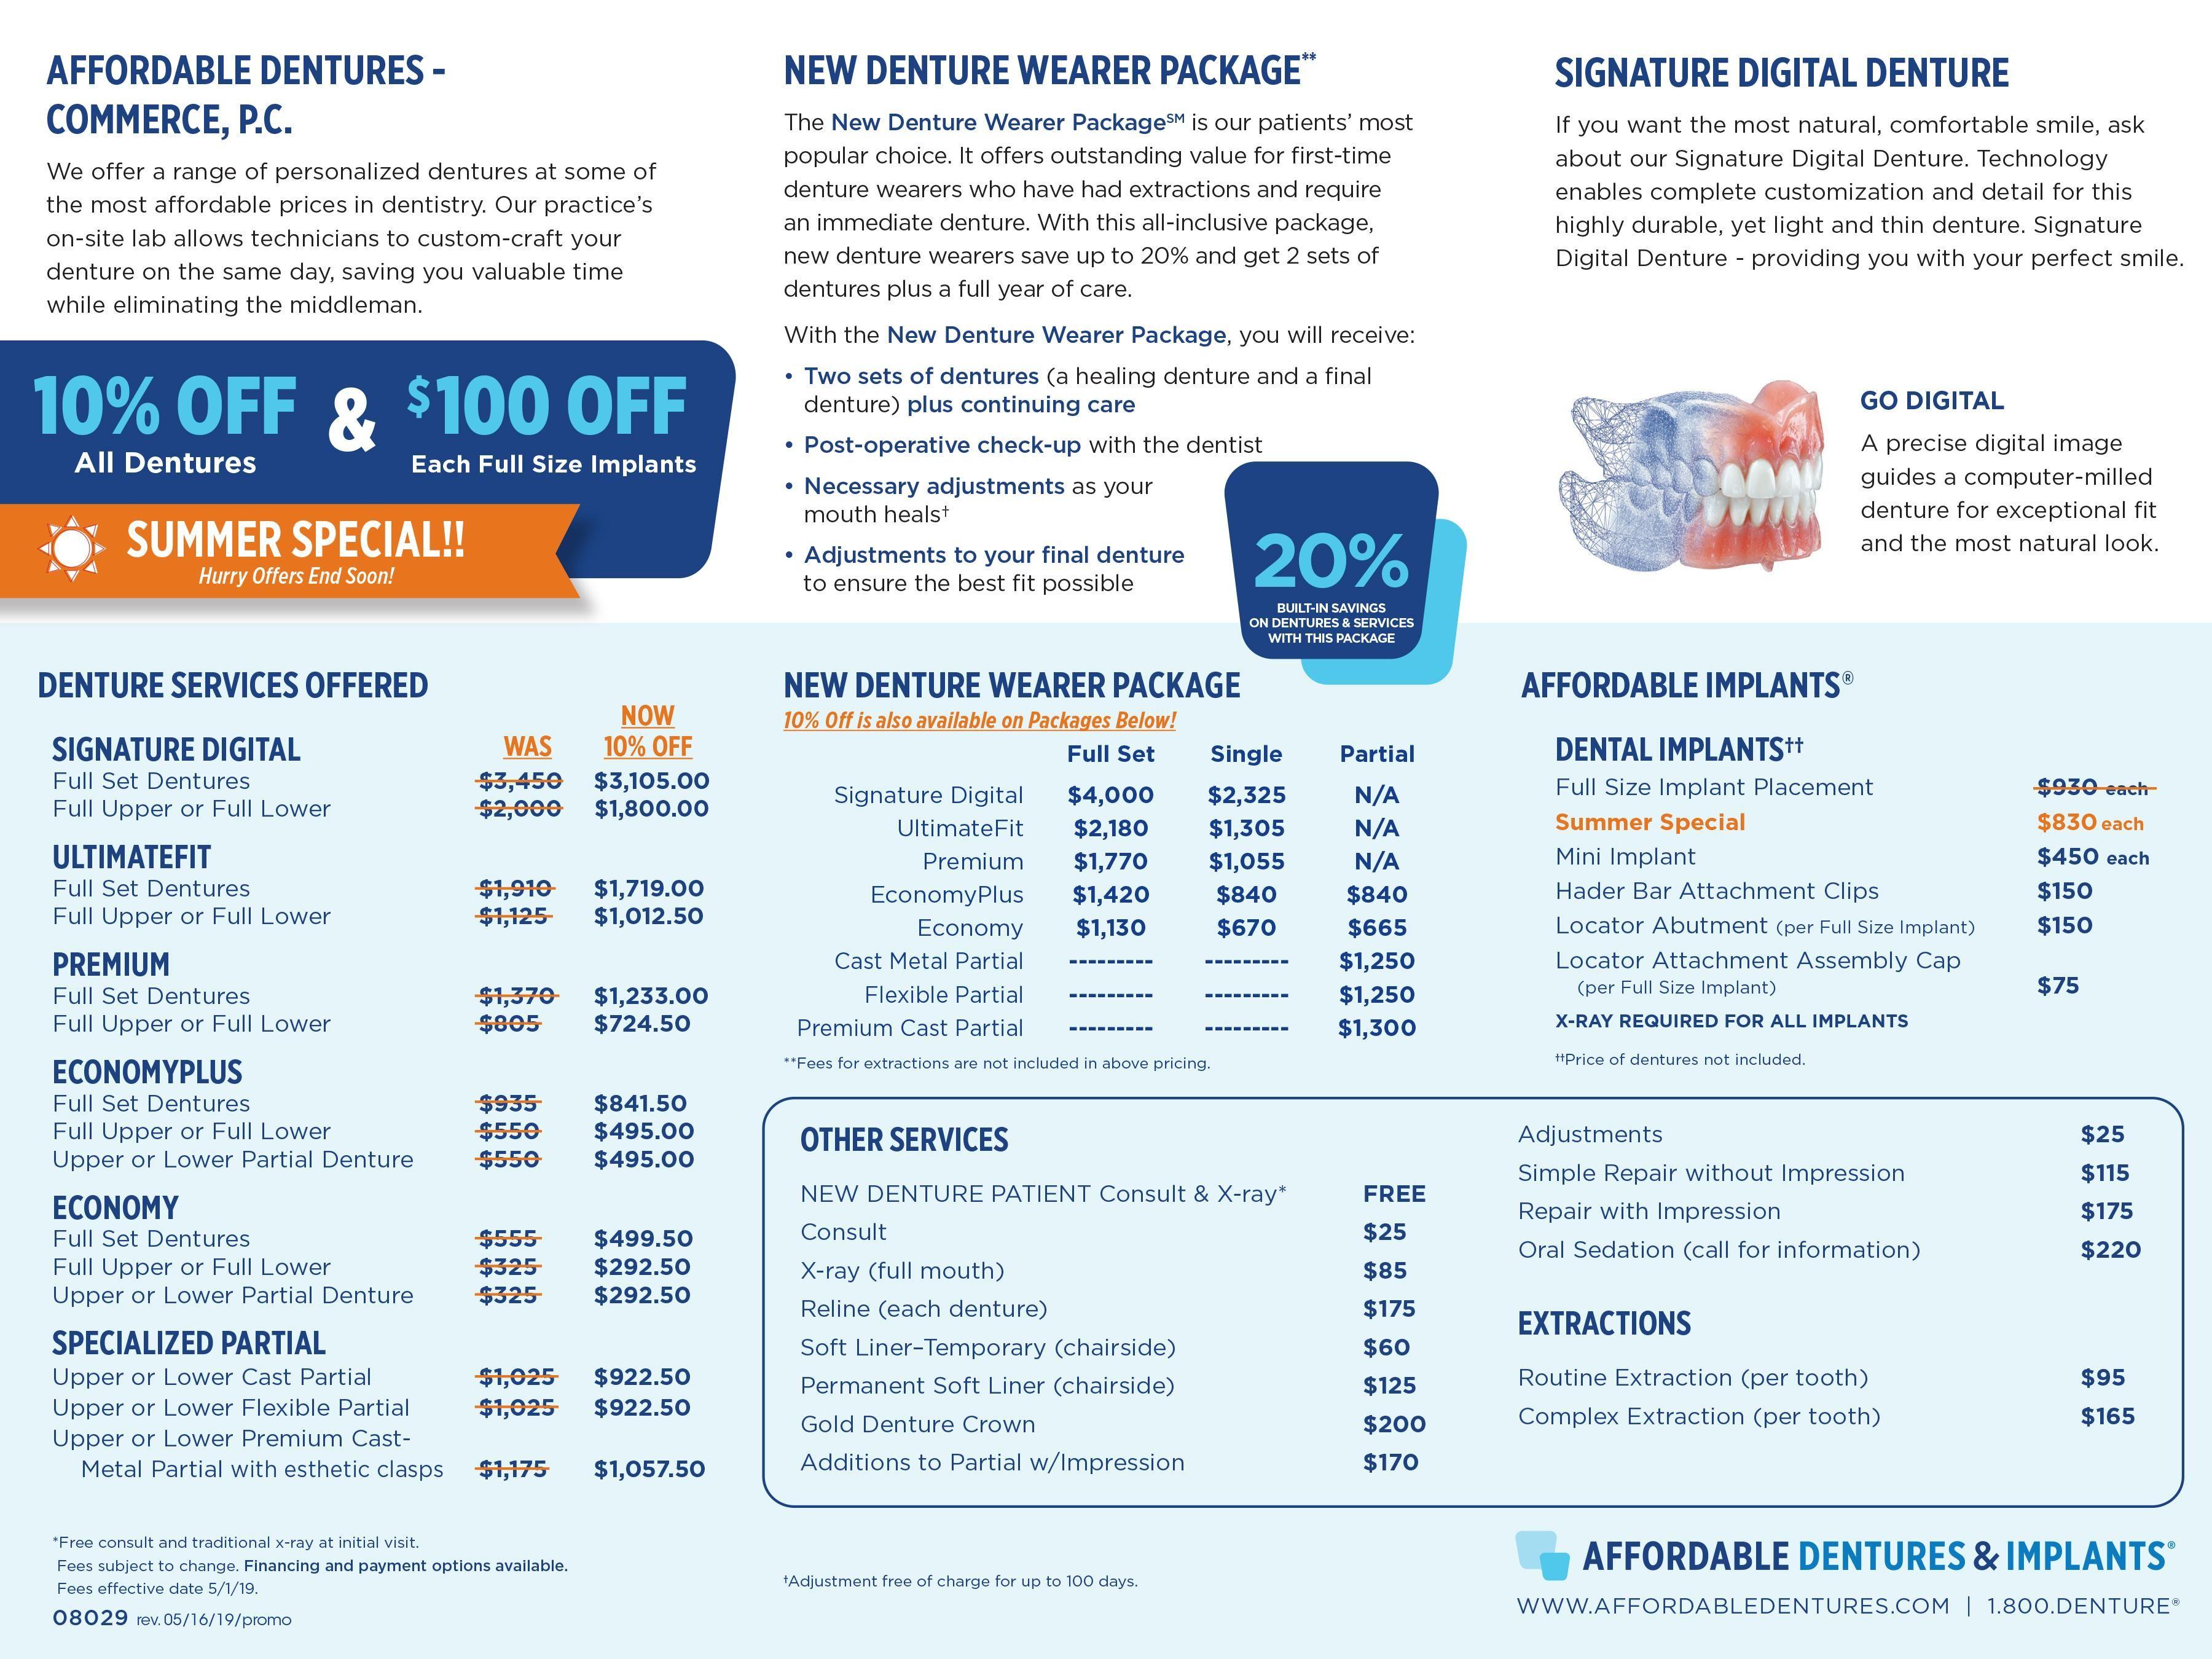 Commerce Ga Denture Care Center Dentist 30529 Affordable